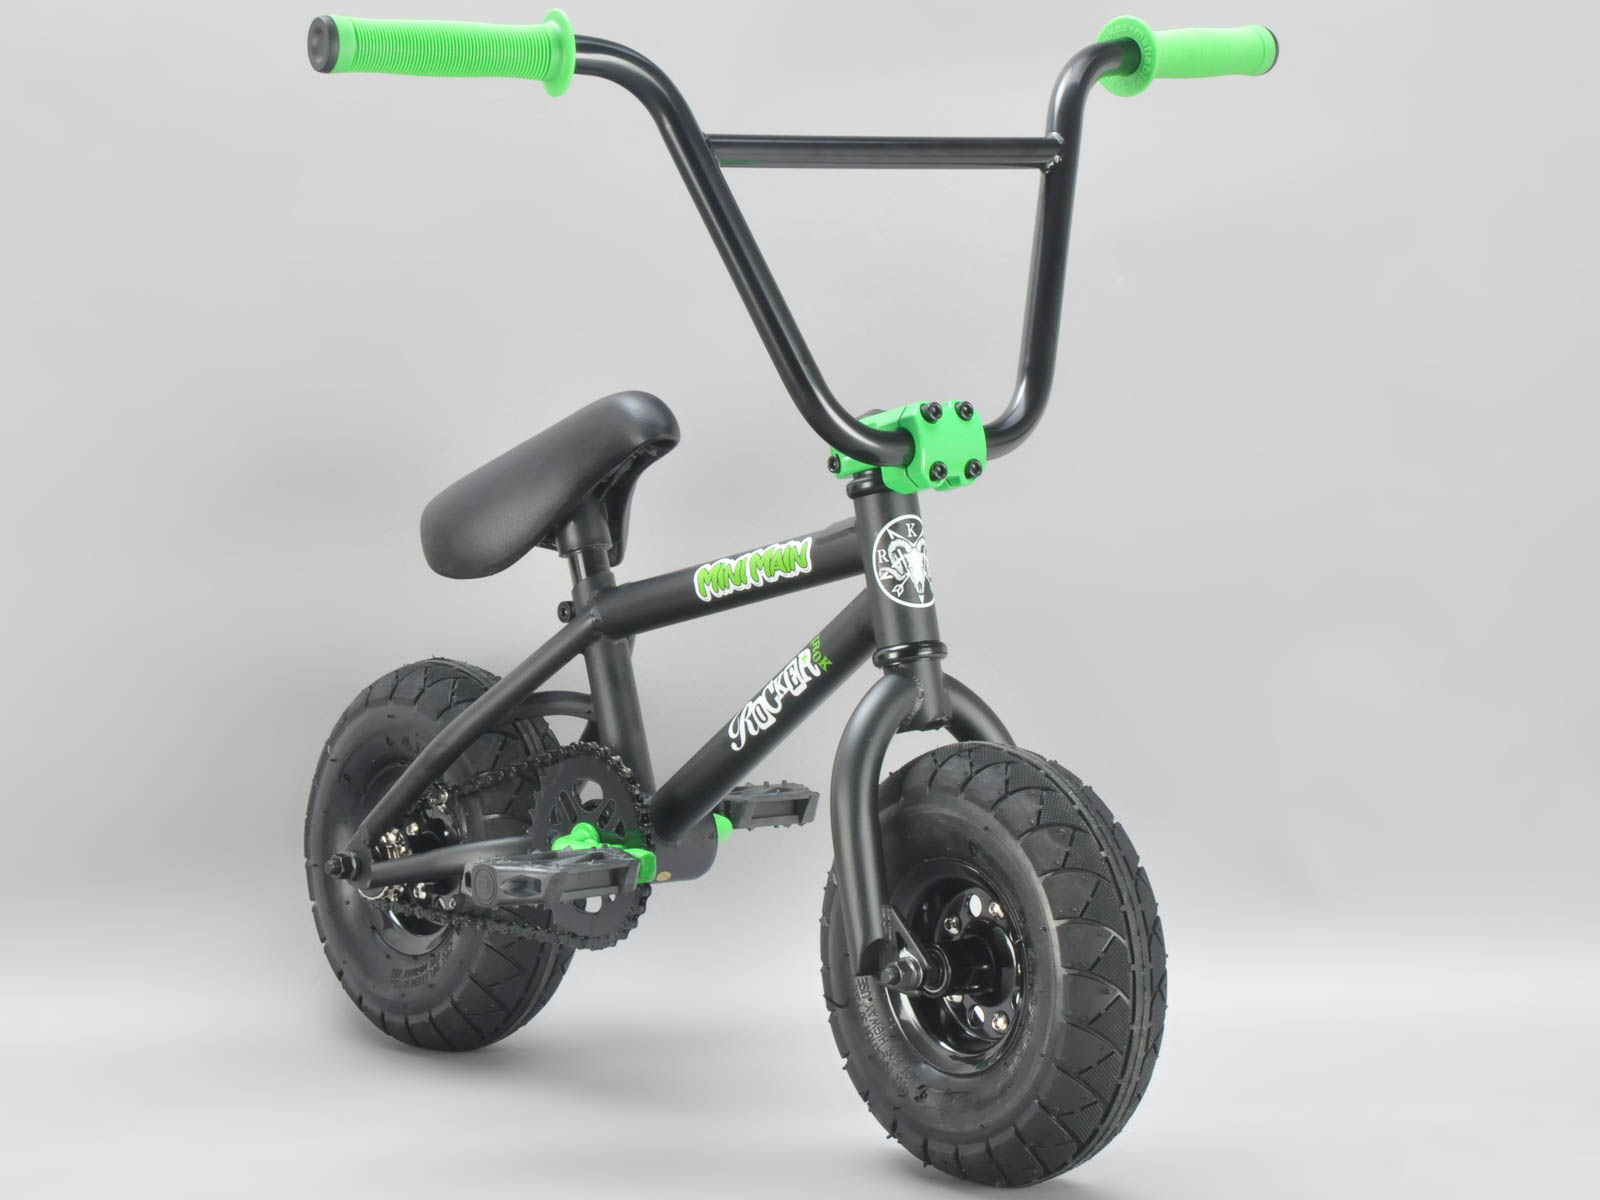 rocker bmx mini bmx bike mini main with black tyres irok. Black Bedroom Furniture Sets. Home Design Ideas